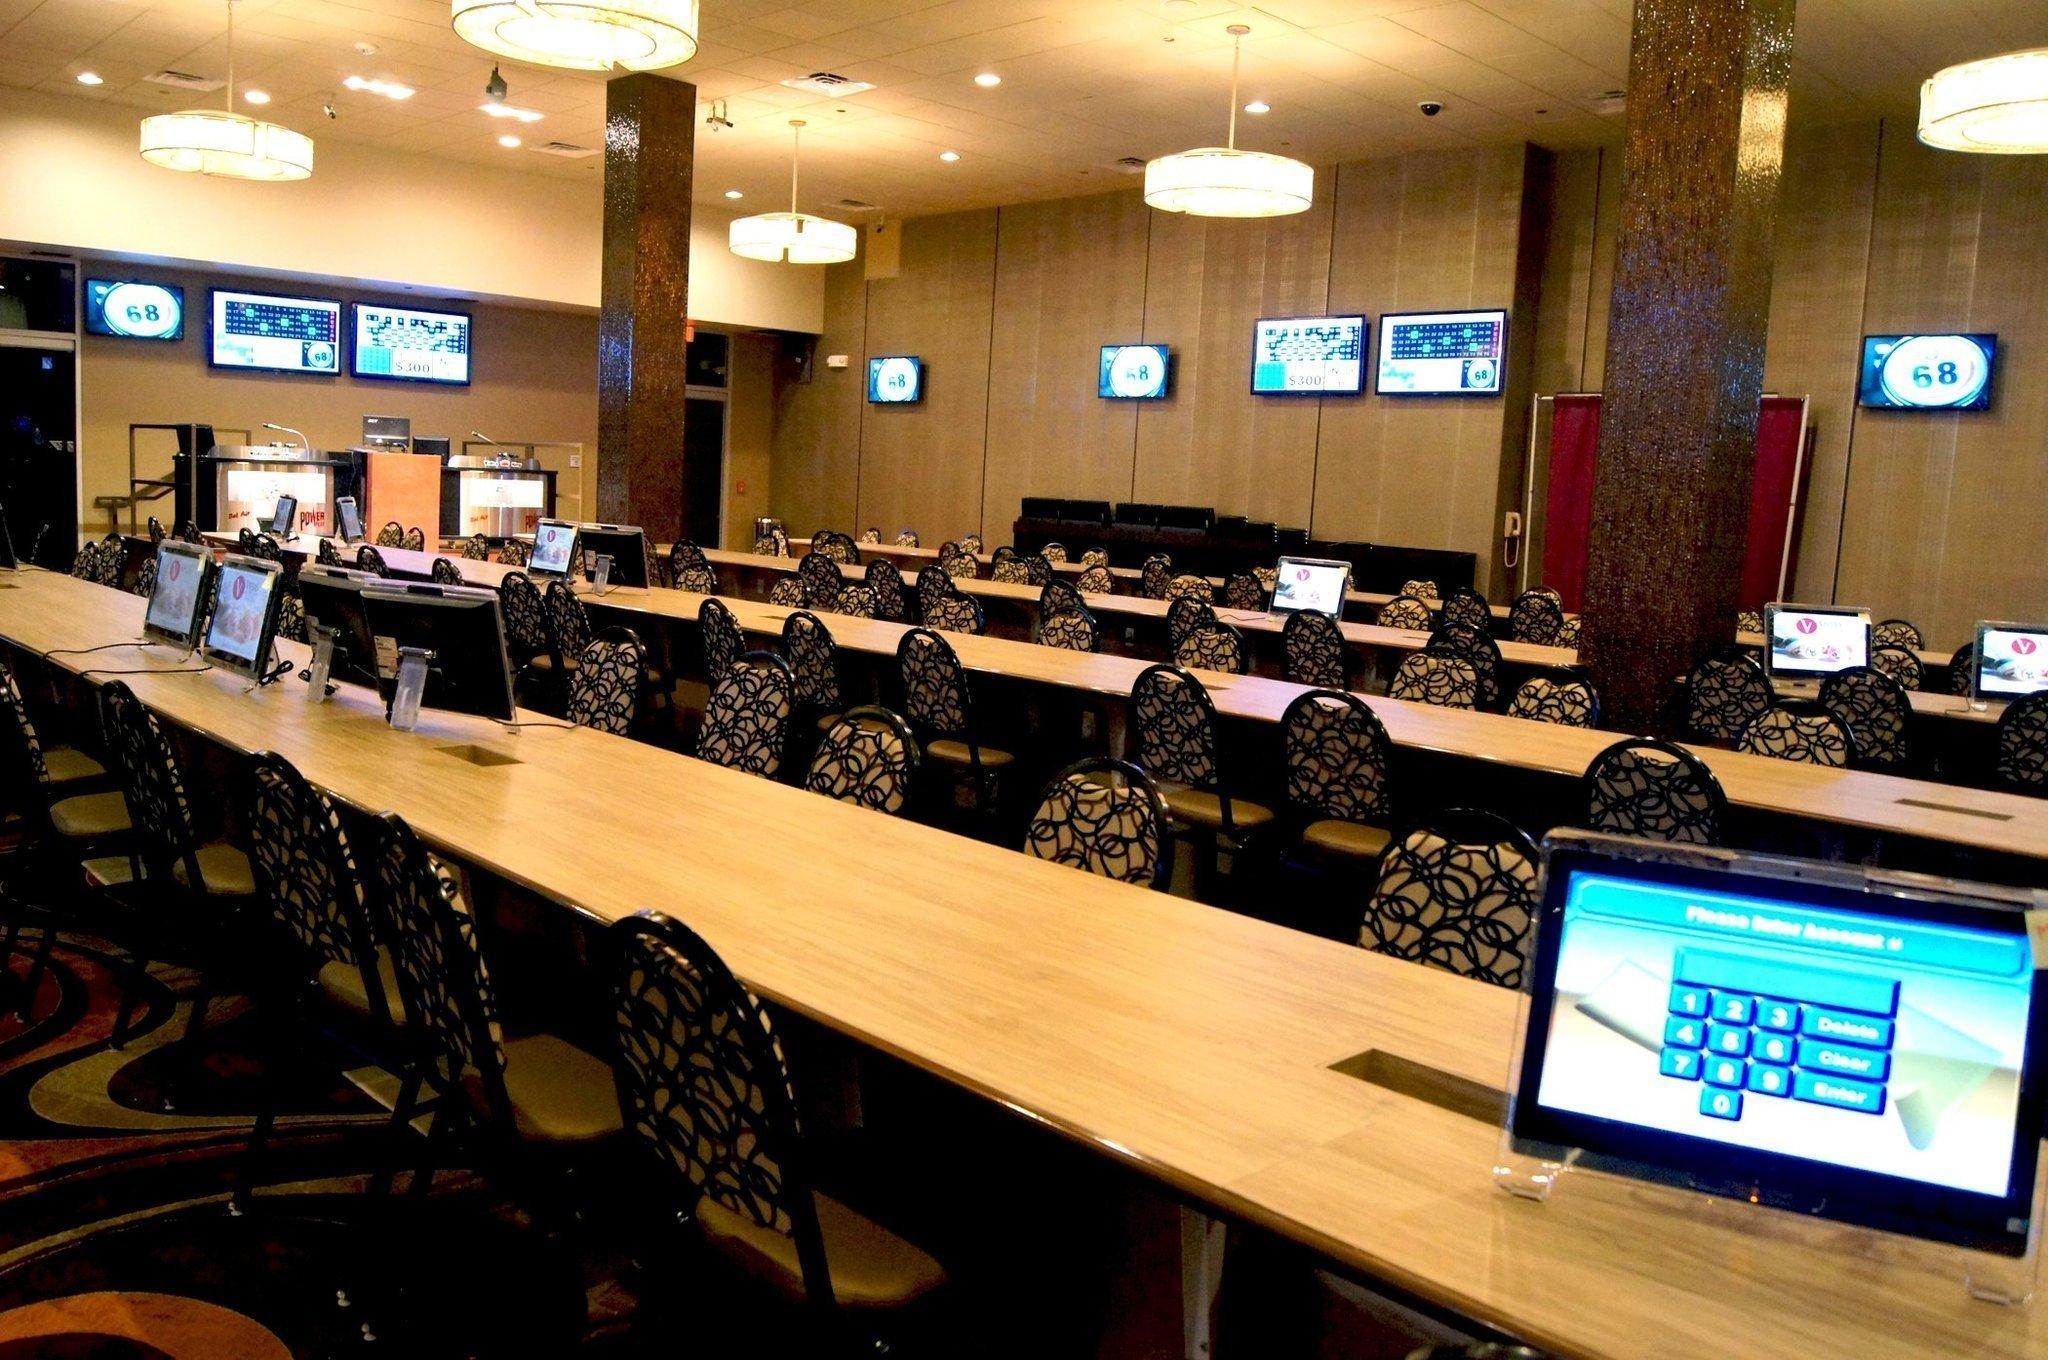 Viejas Casino Hotel Rooms